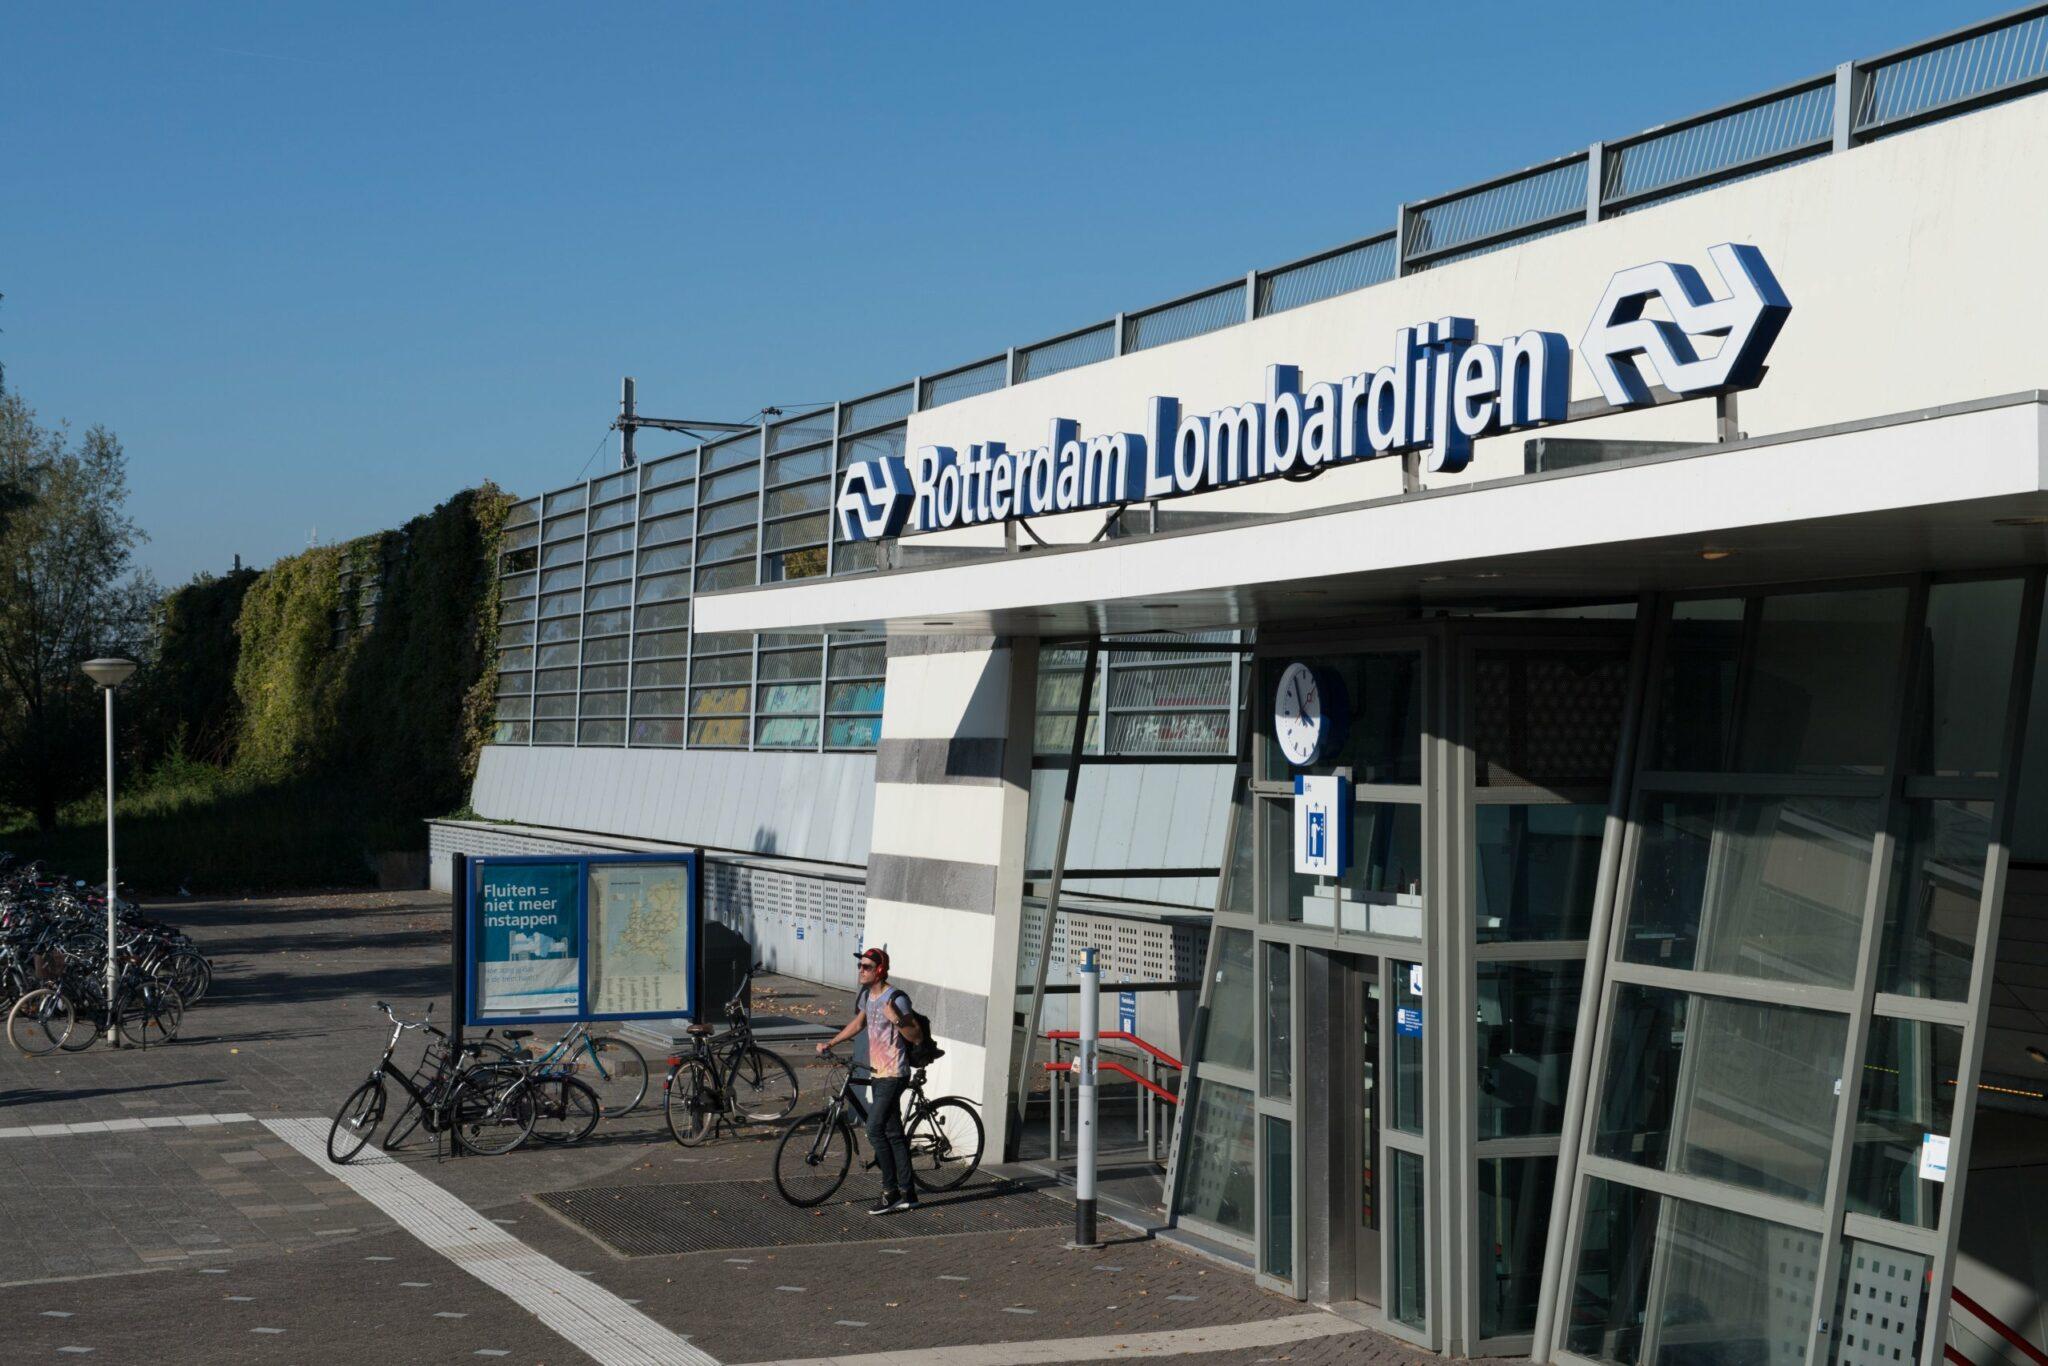 station lombardijen